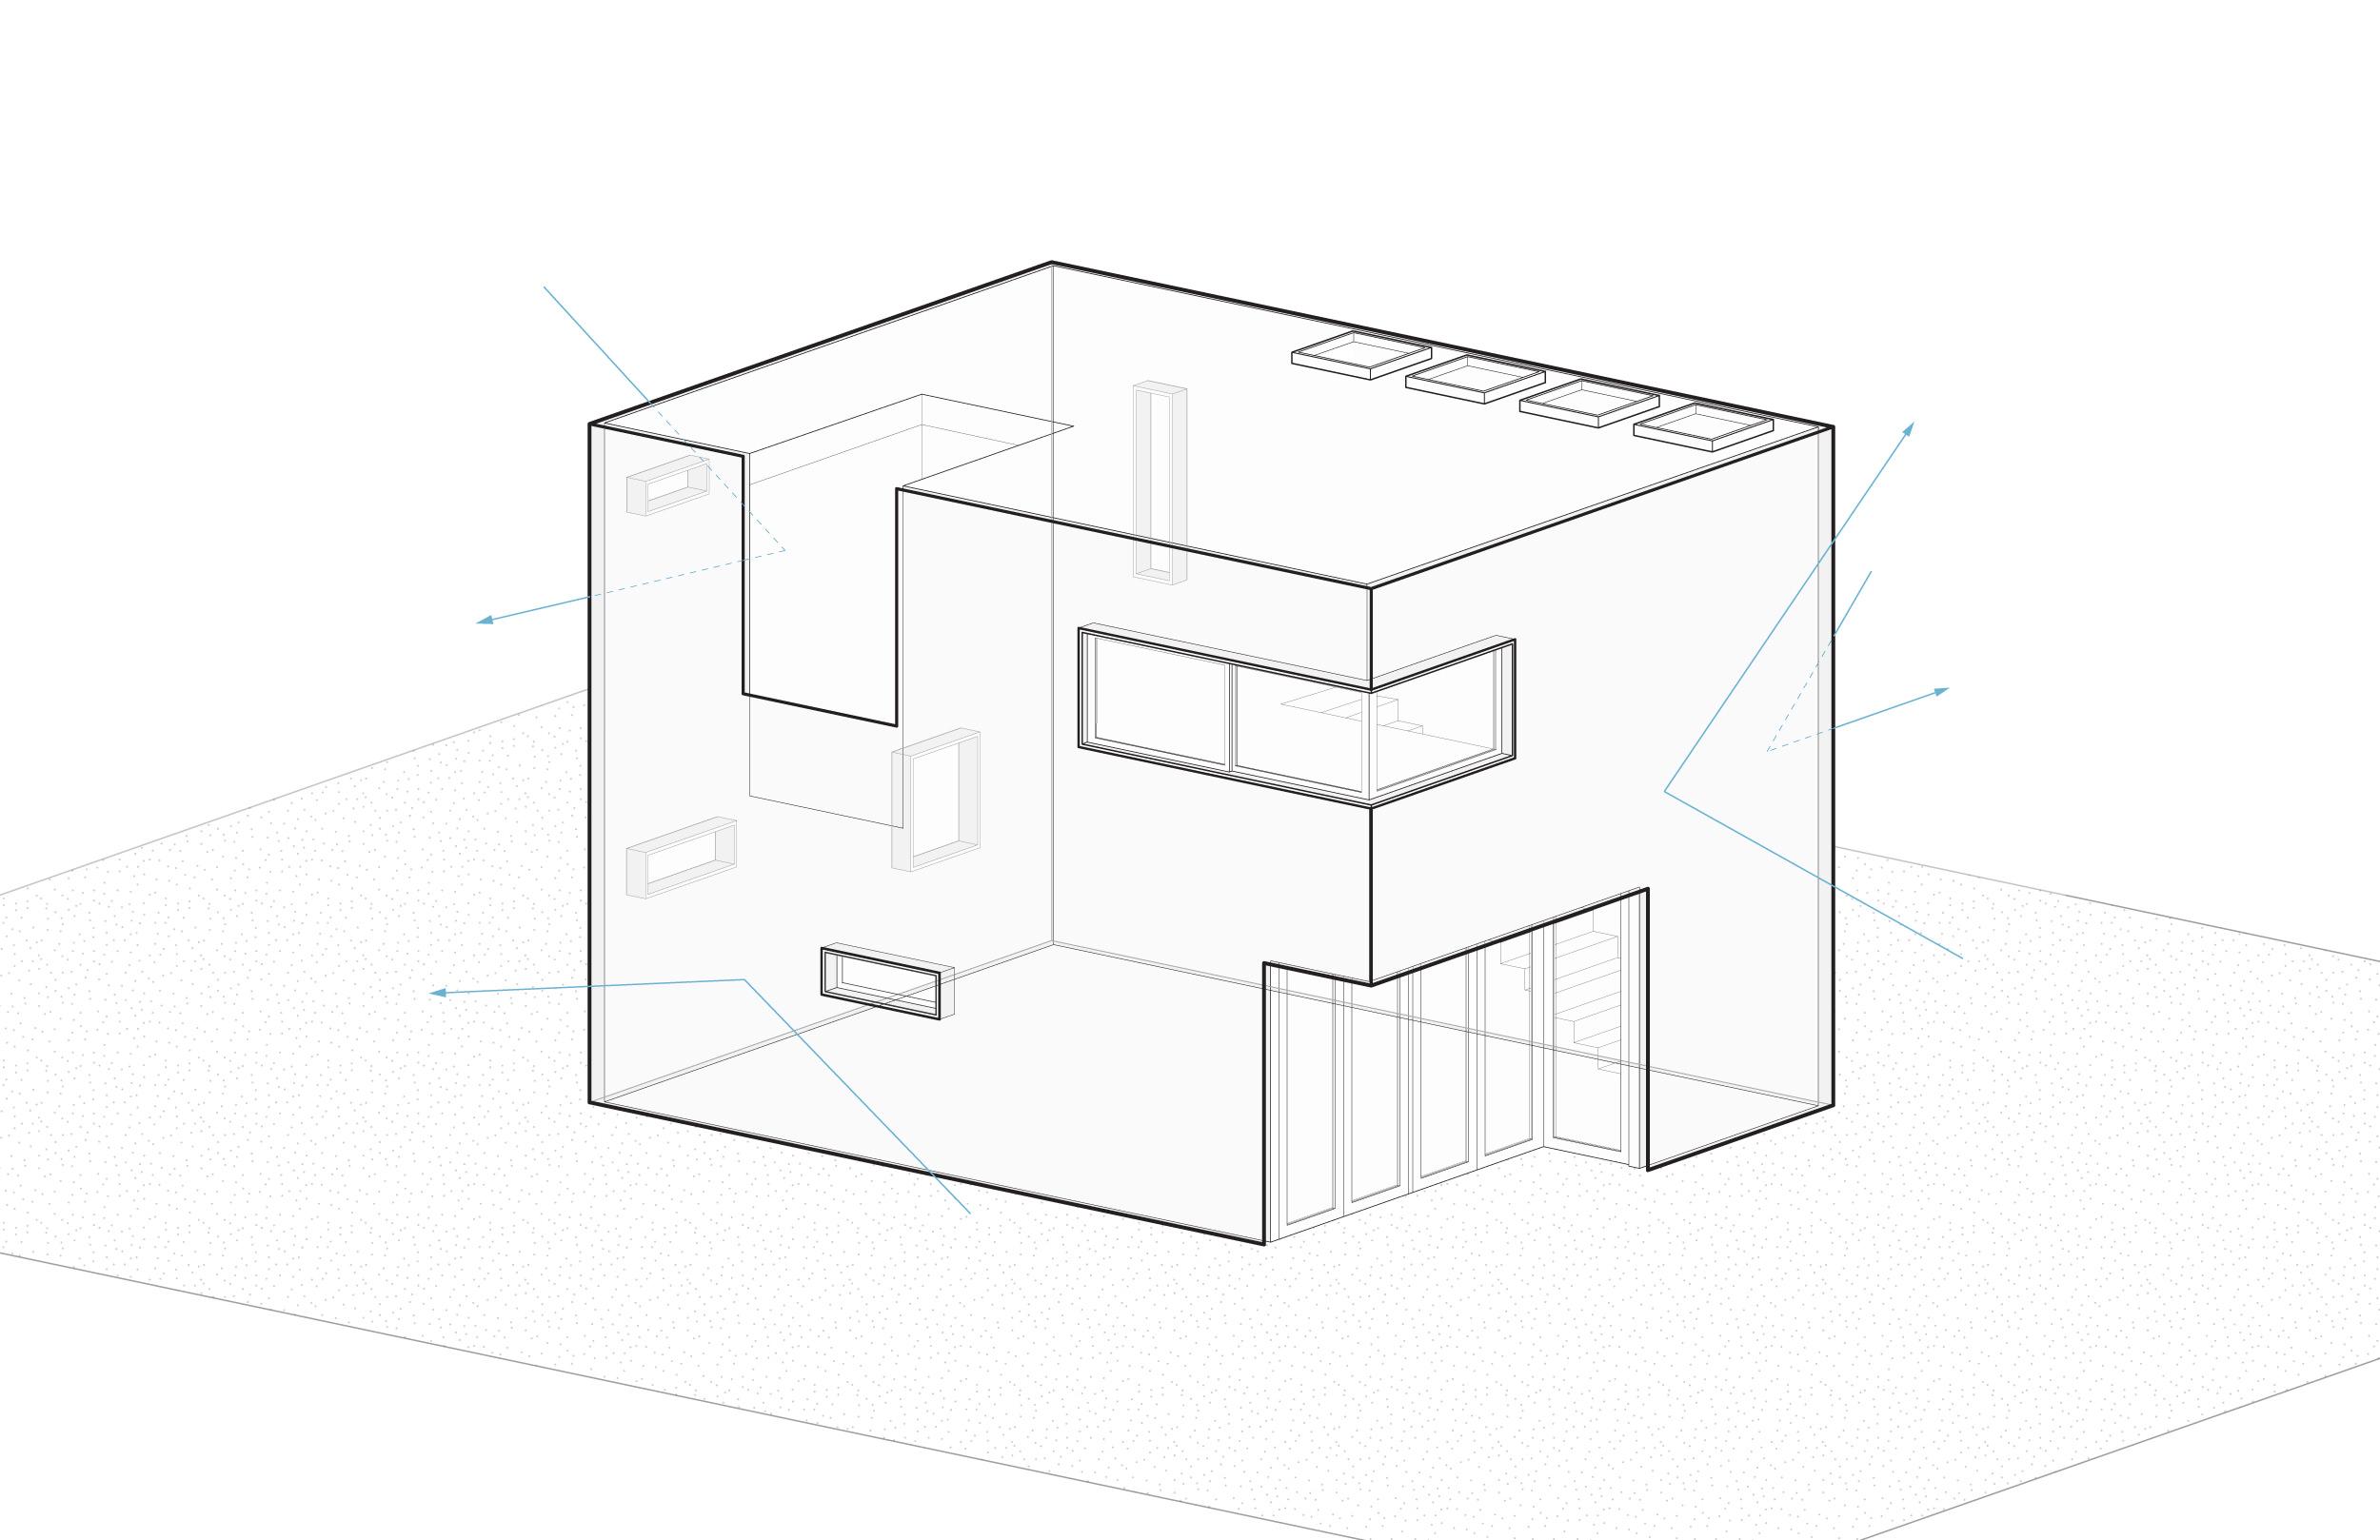 Studio-City-House_Diagram_06.jpg